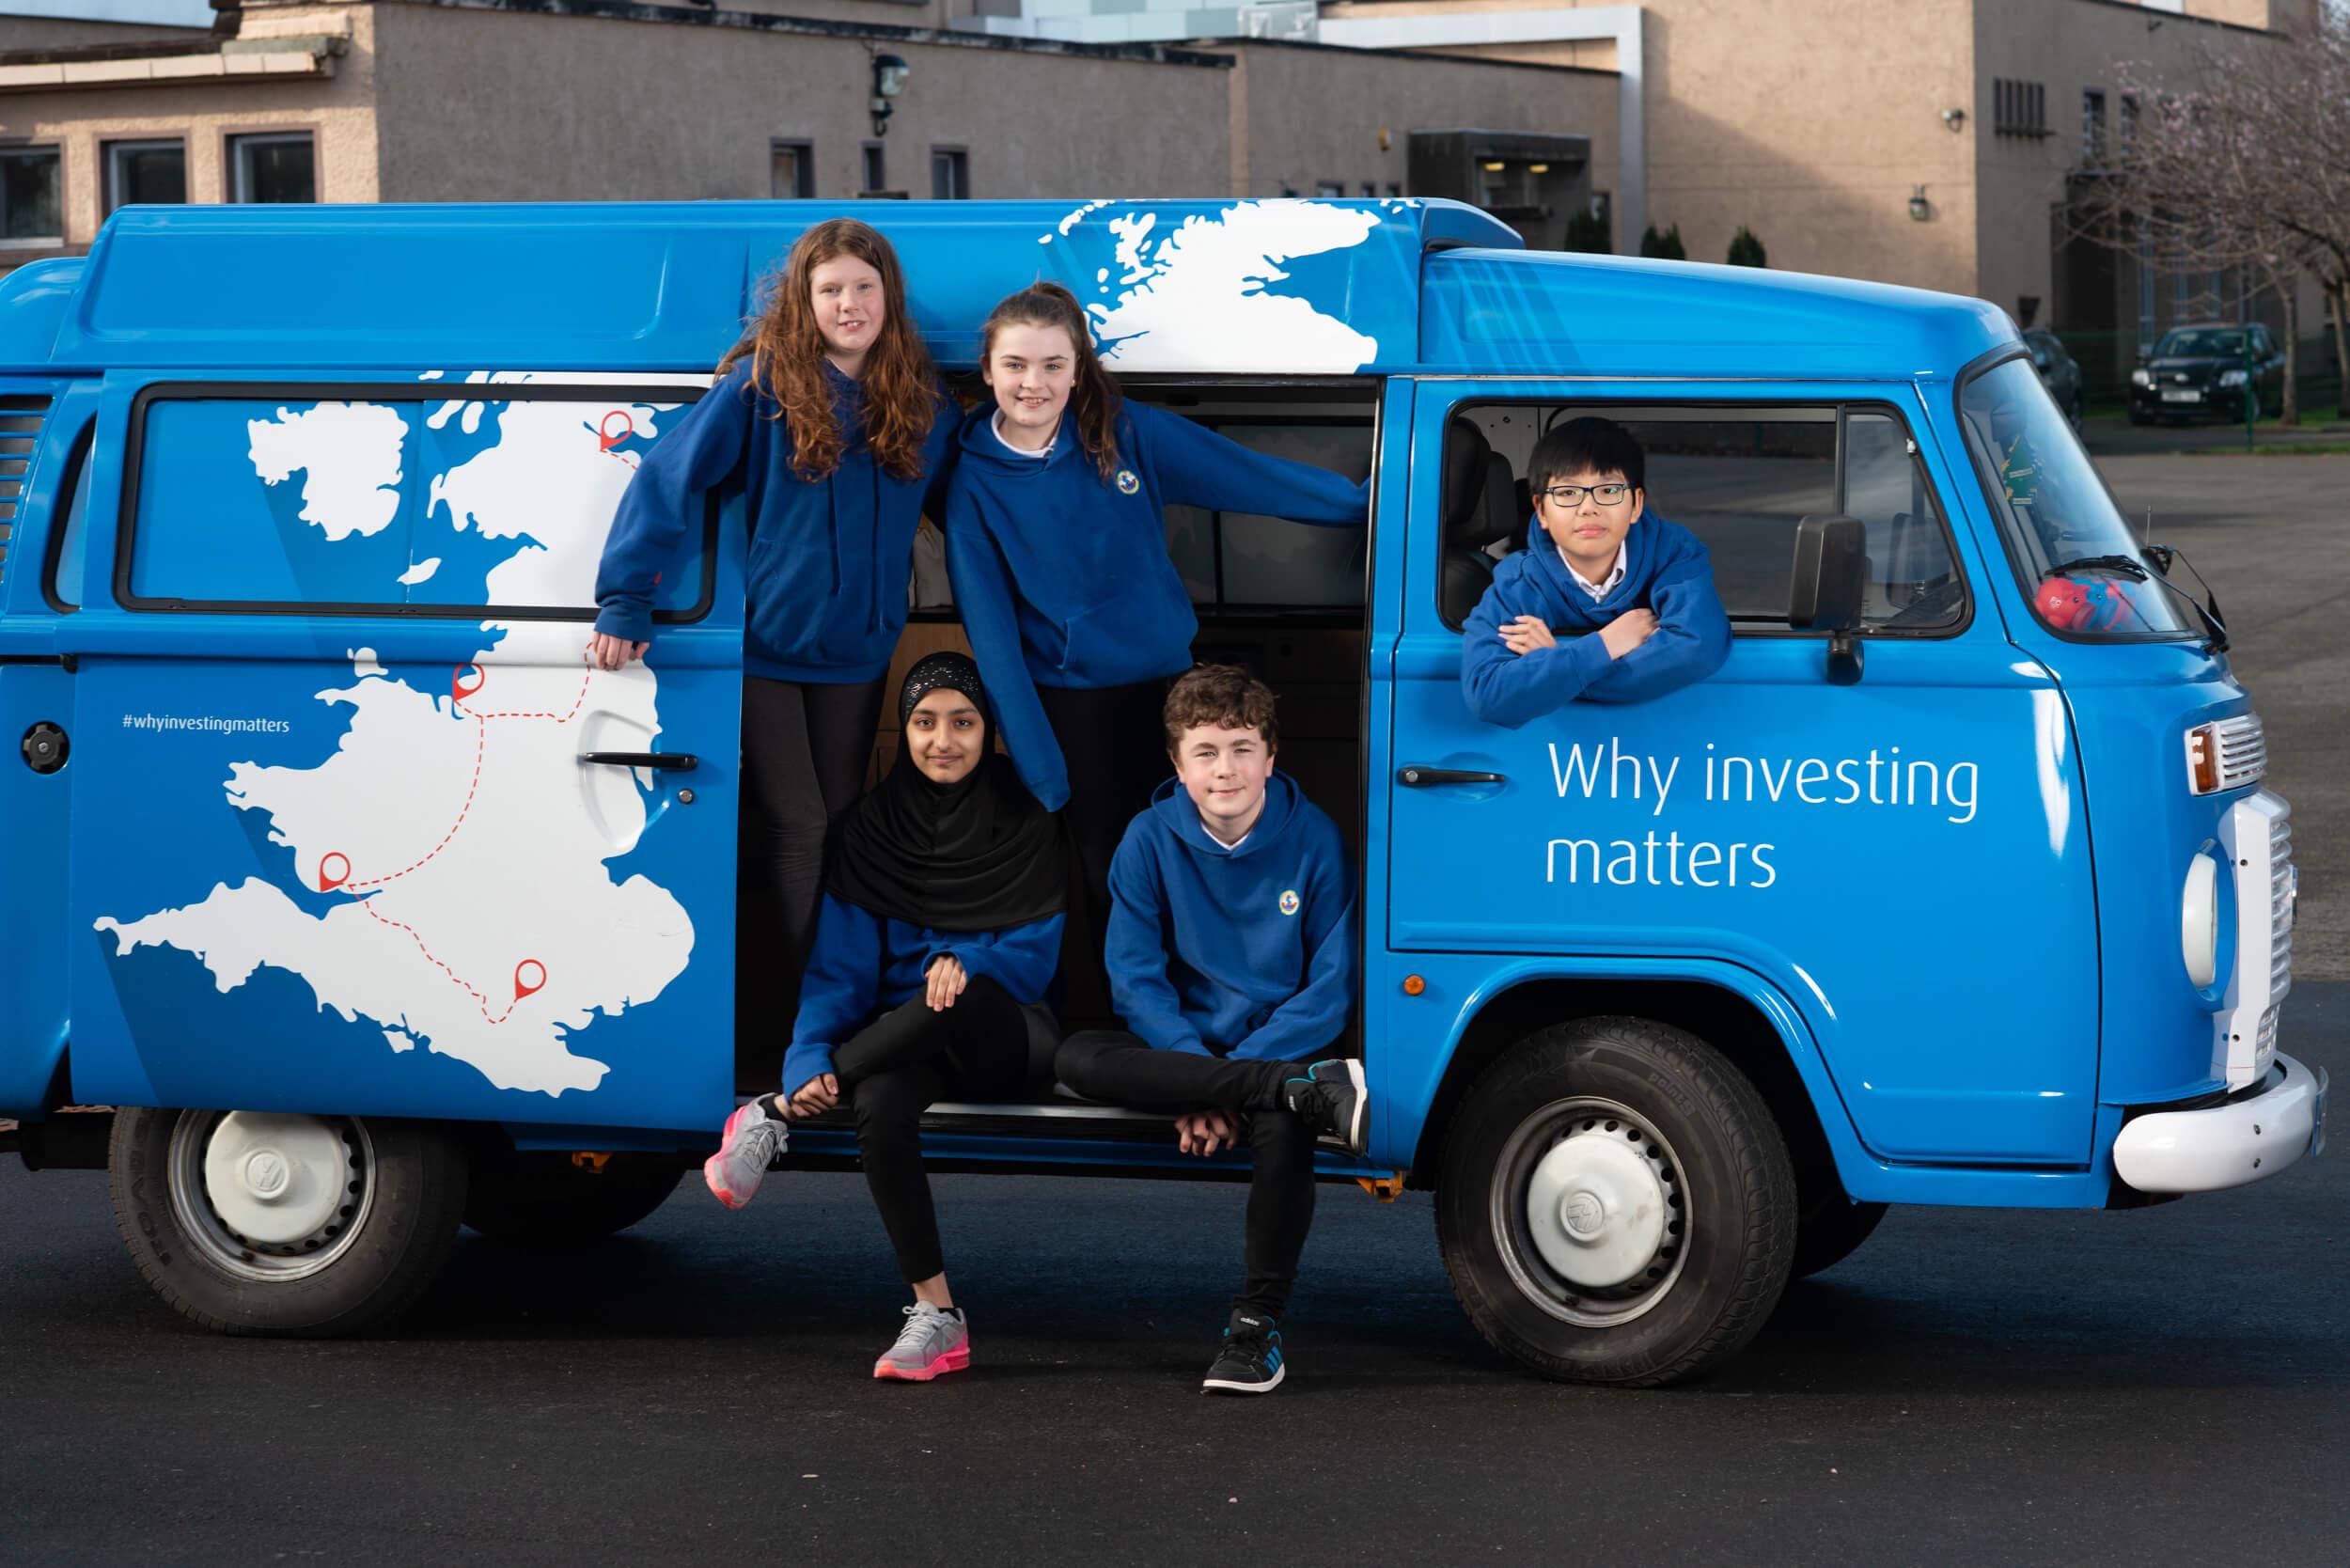 Five children sitting in the blue bus